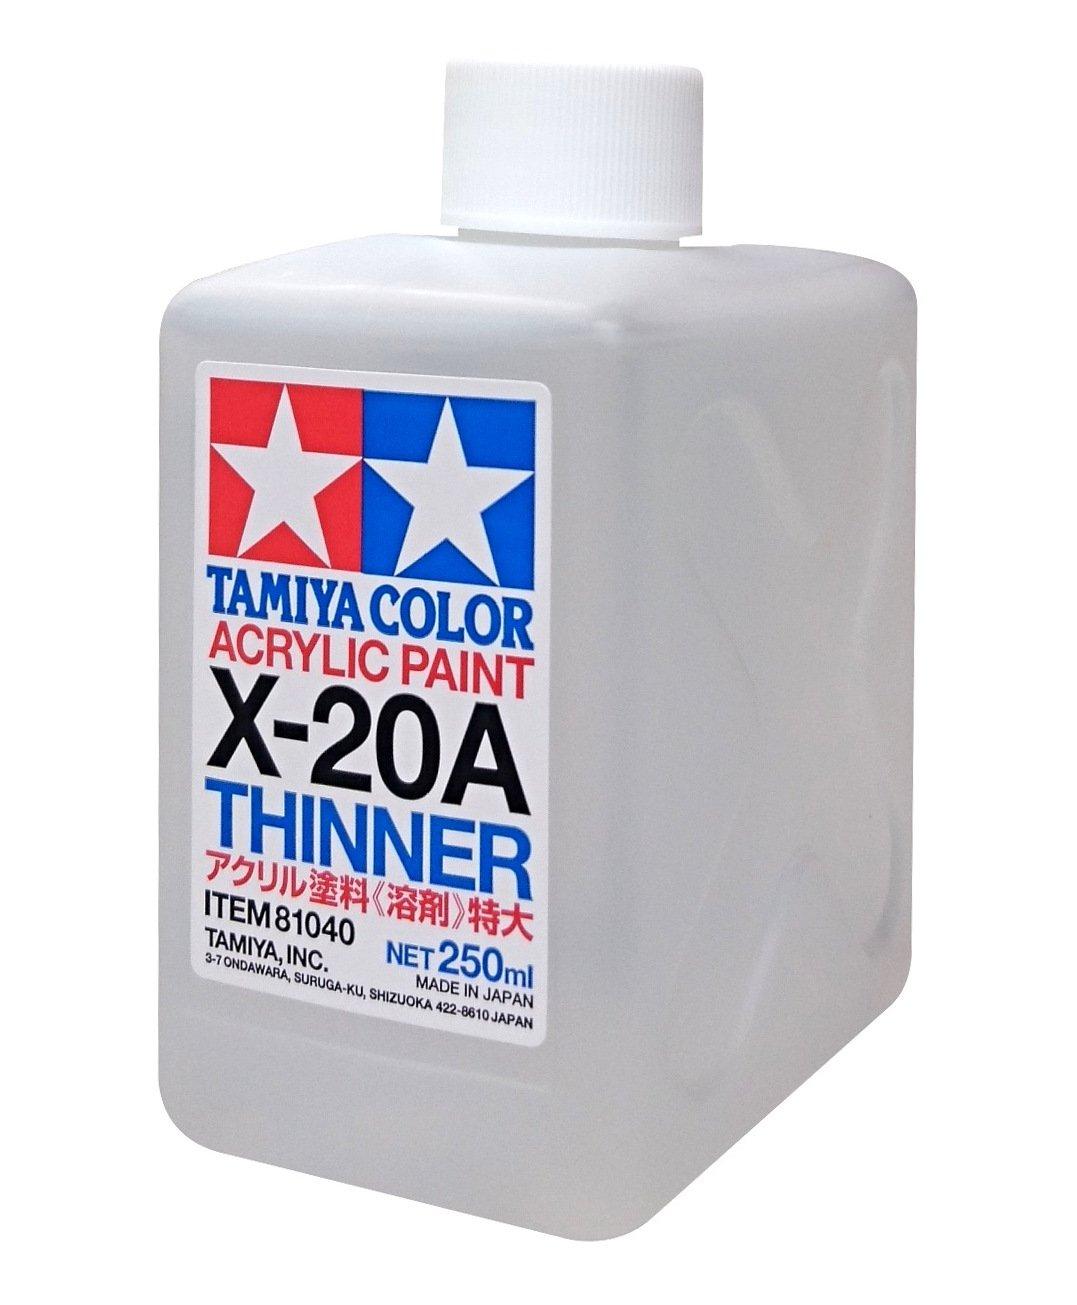 TAMIYA 81040 Acrylic Paint Thinner X-20A 250ml bottle